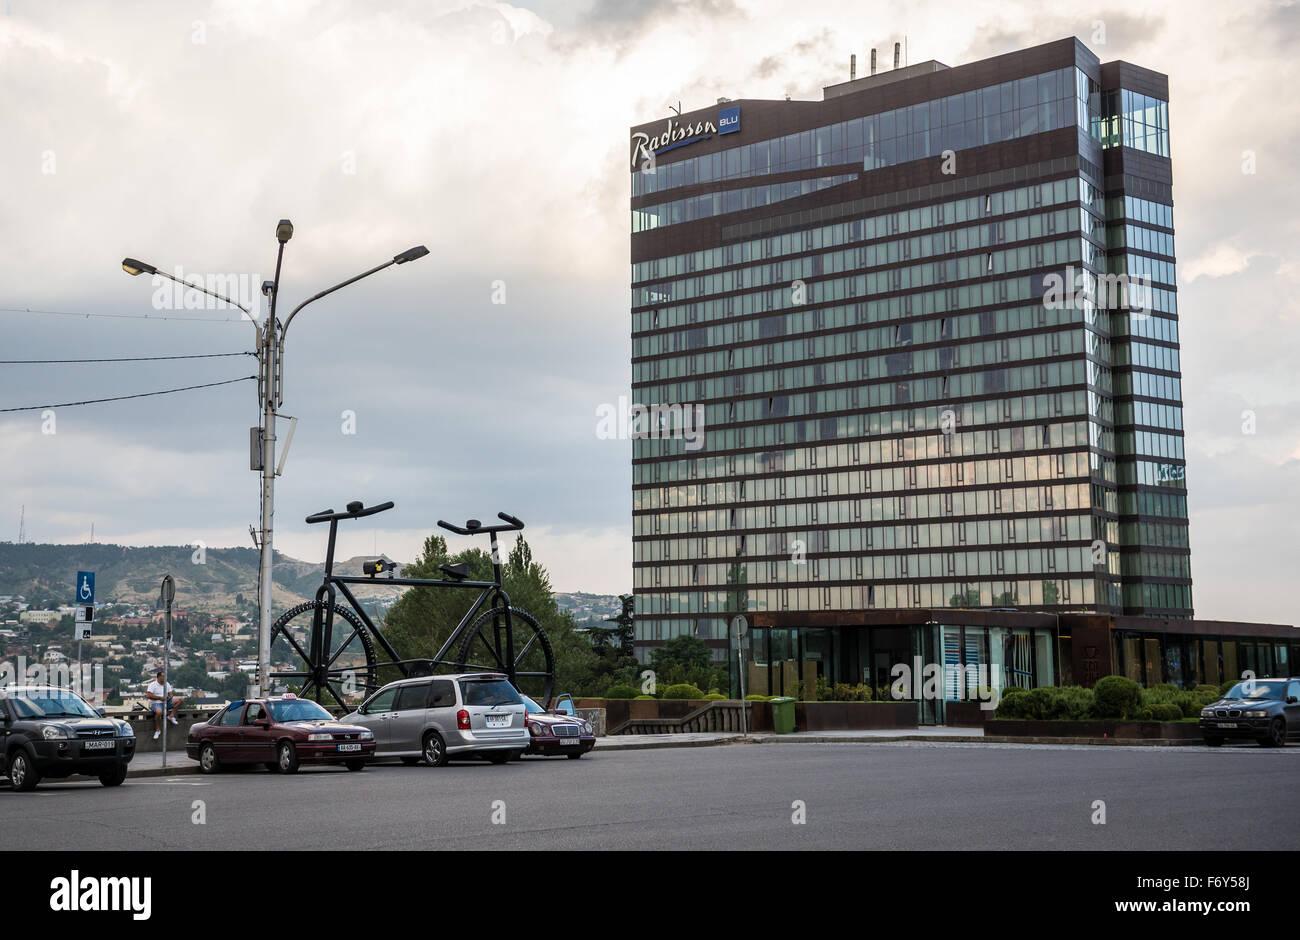 Radisson Blu Iveria Hotel at Rose Revolution Square in Tbilisi, capital of Georgia - Stock Image